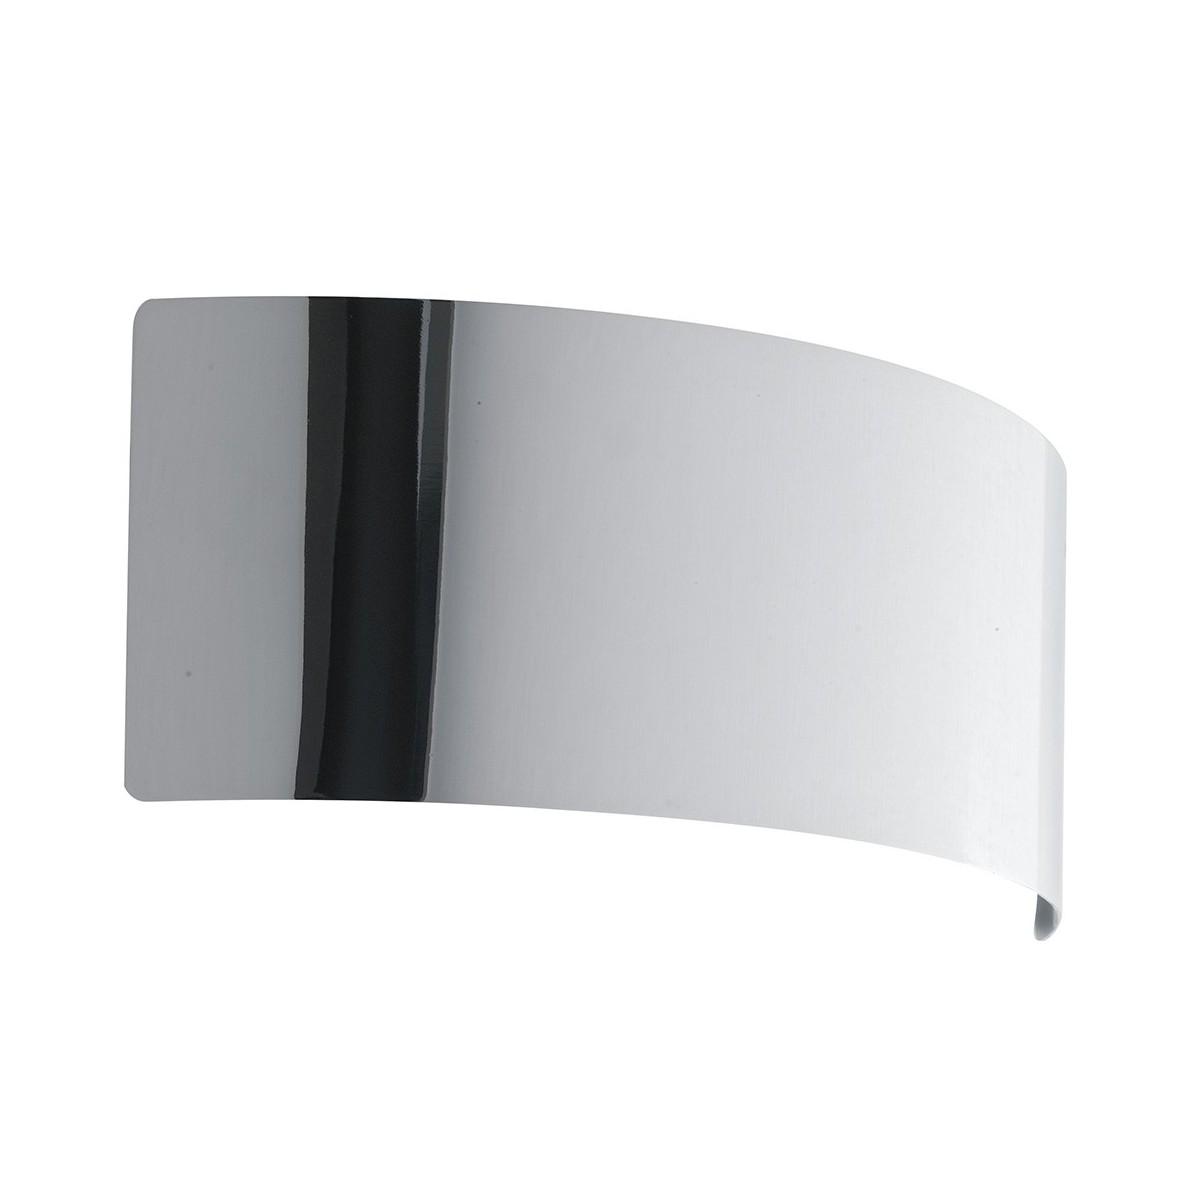 LED-DYNAMIC-AP32 CR - Applique Arcuata Metallo Cromato Lampada da Parete Moderna Led 8 watt Luce Naturale